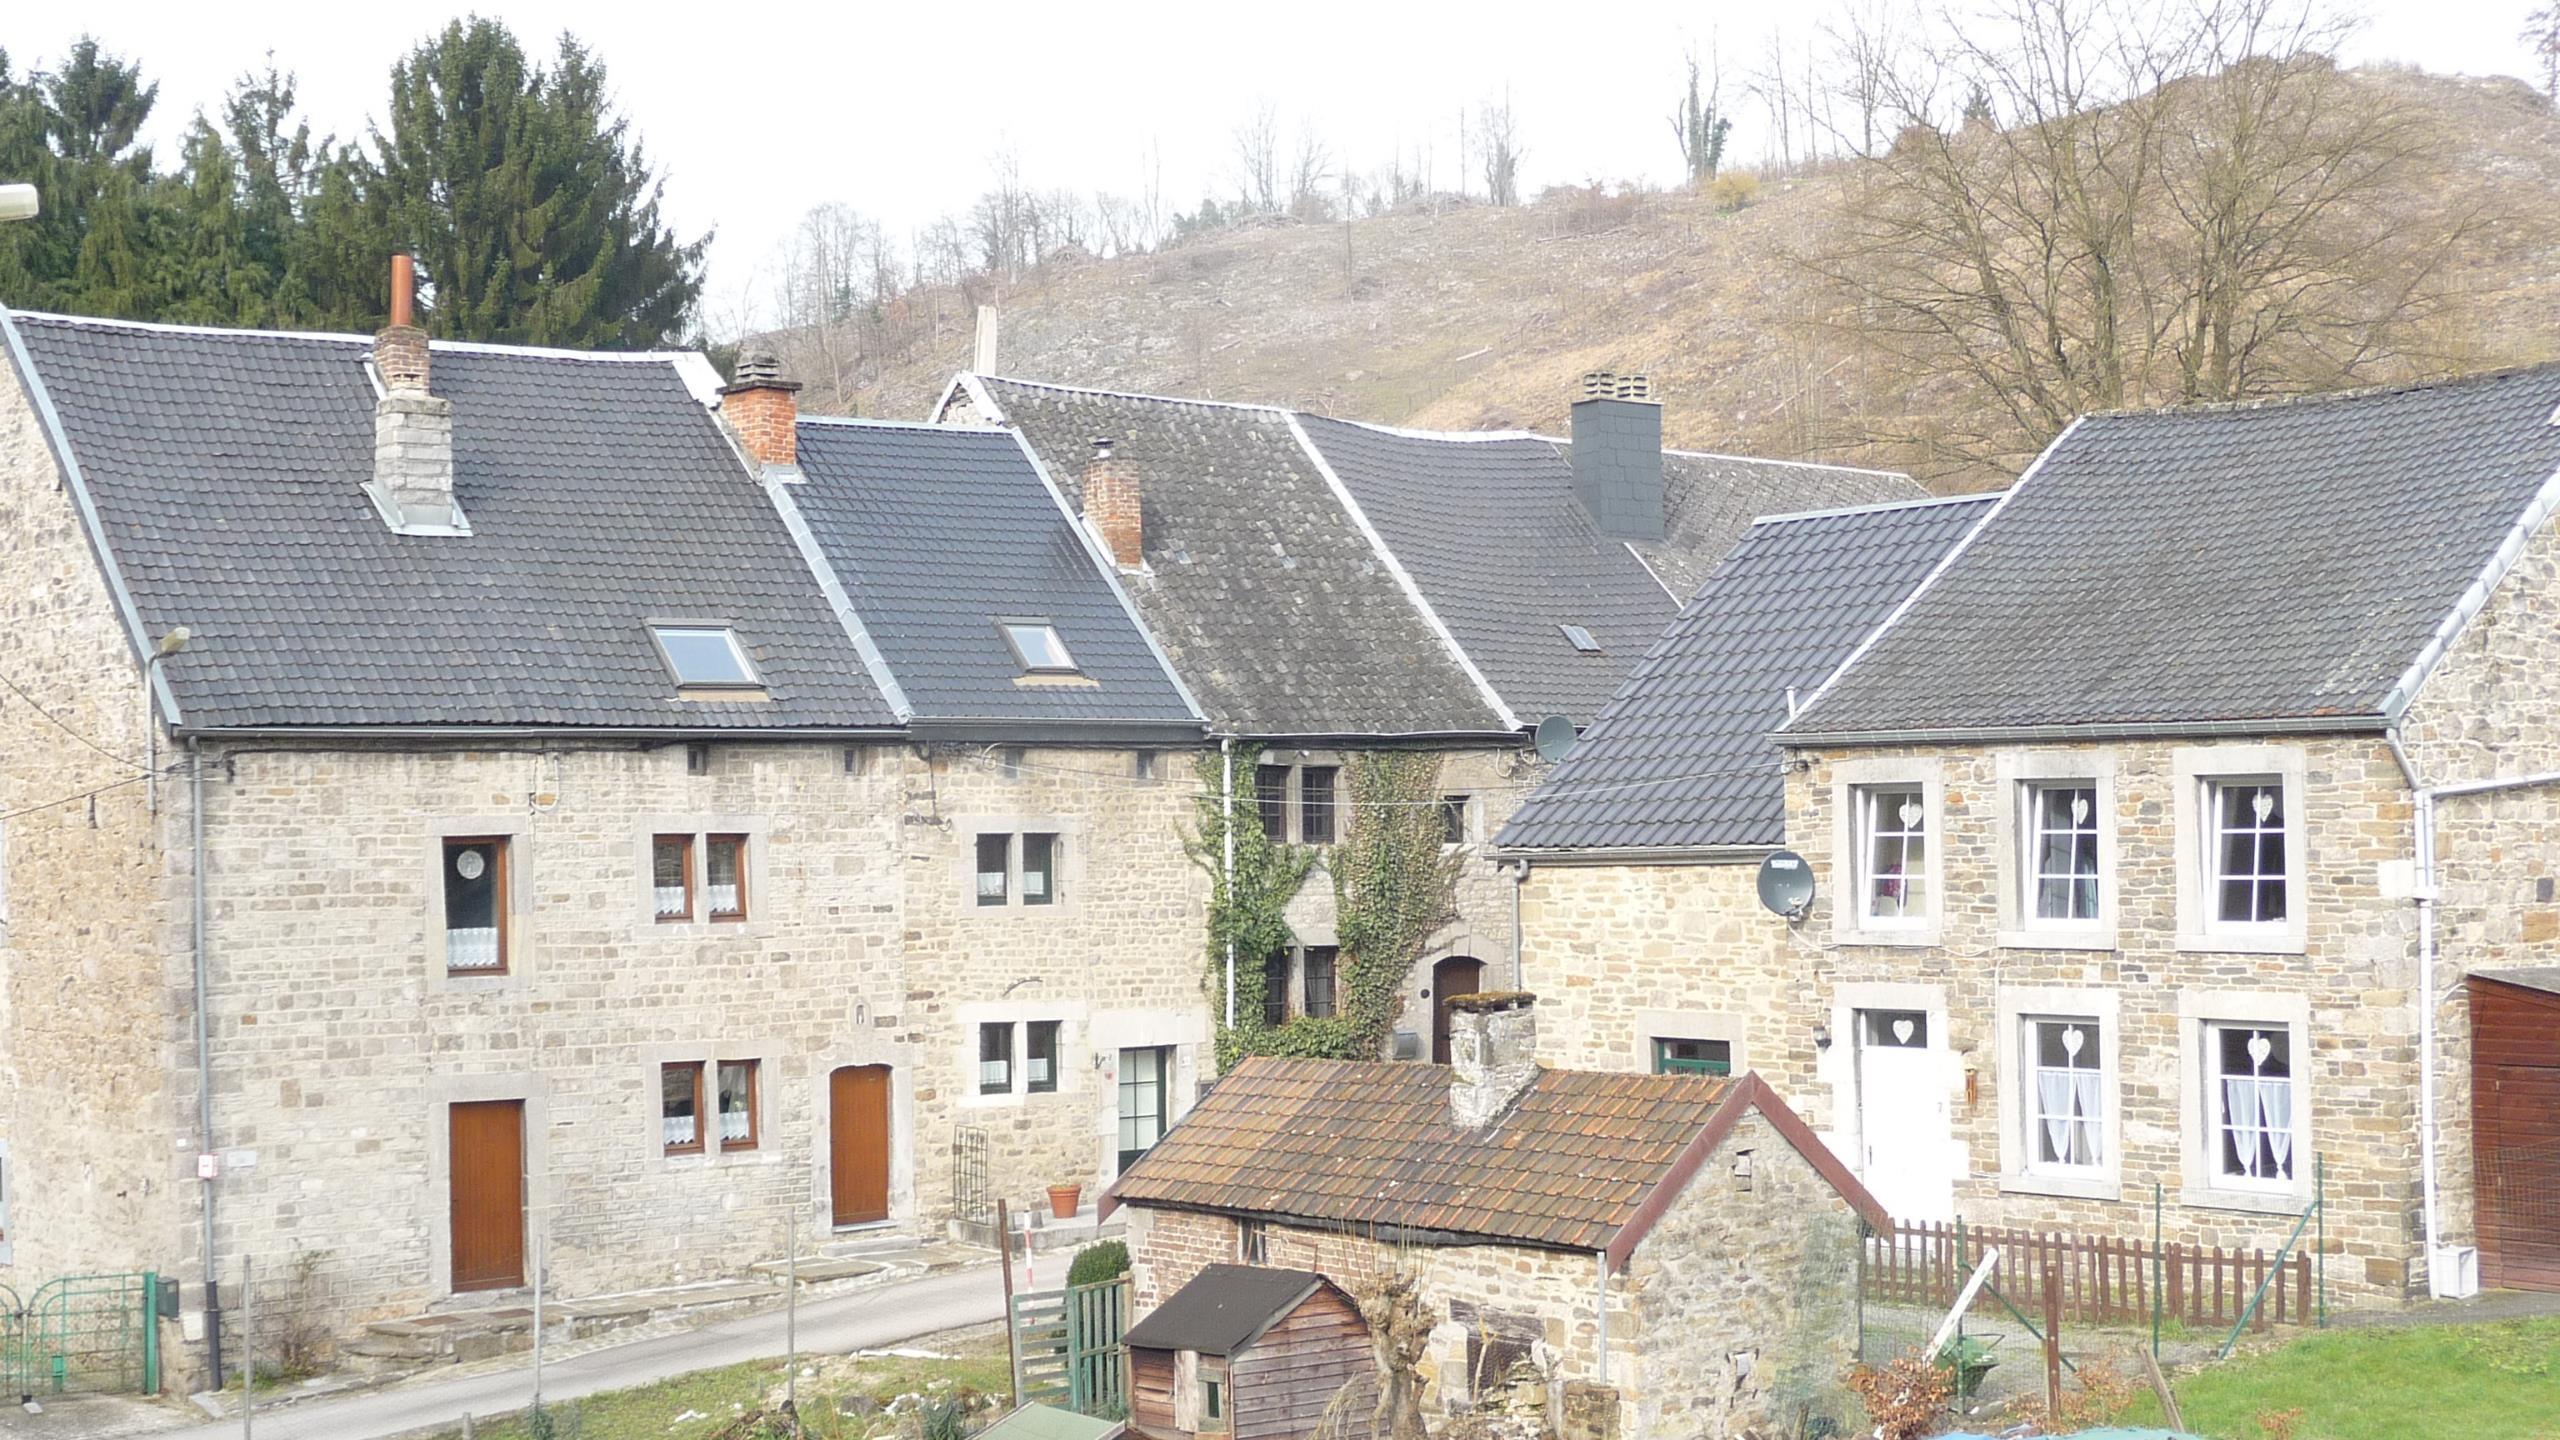 The village of Martinrive